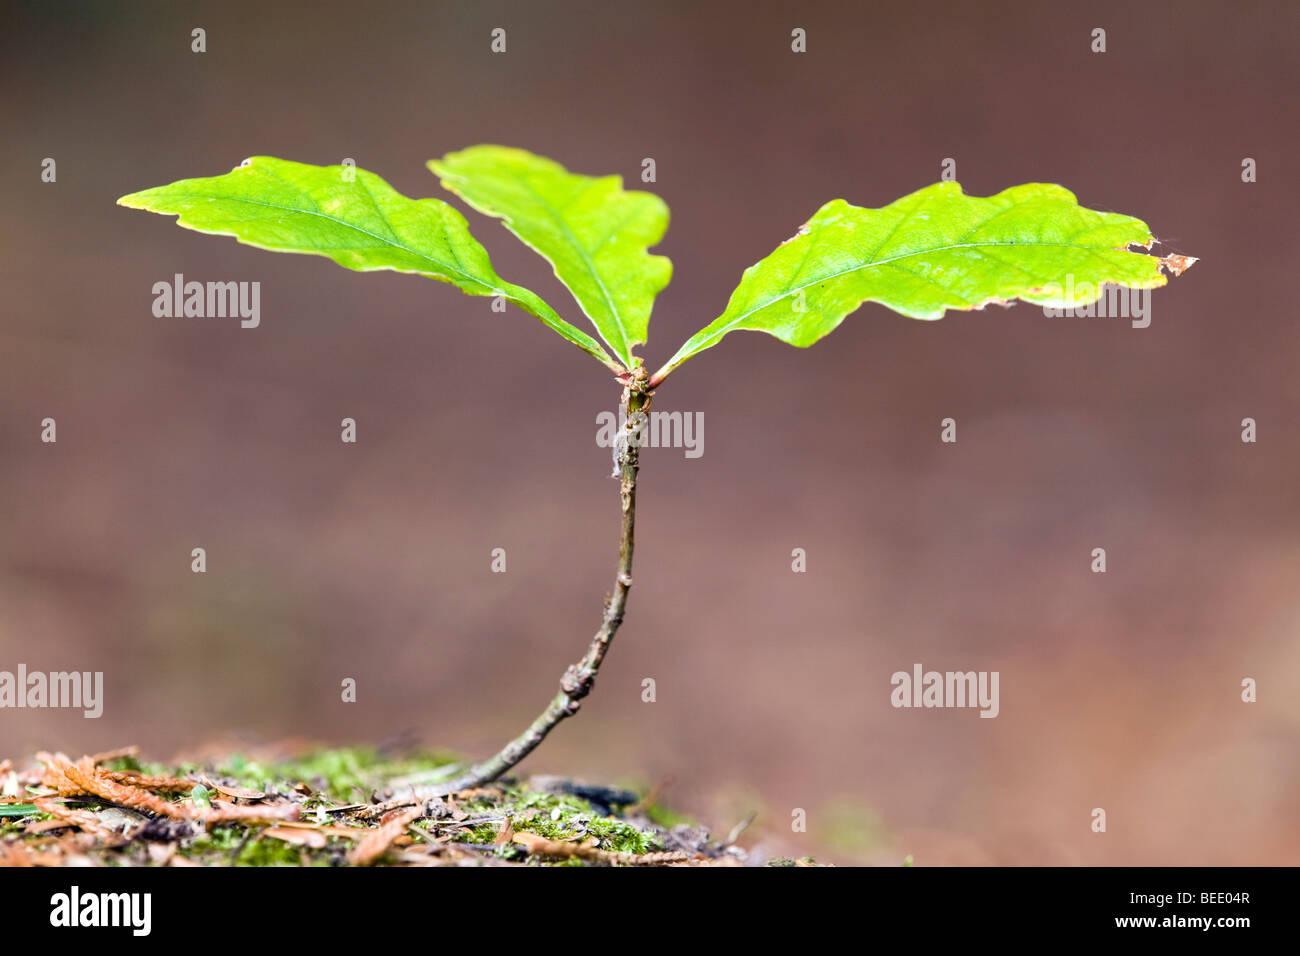 Oak sapling; Quercus robur - Stock Image